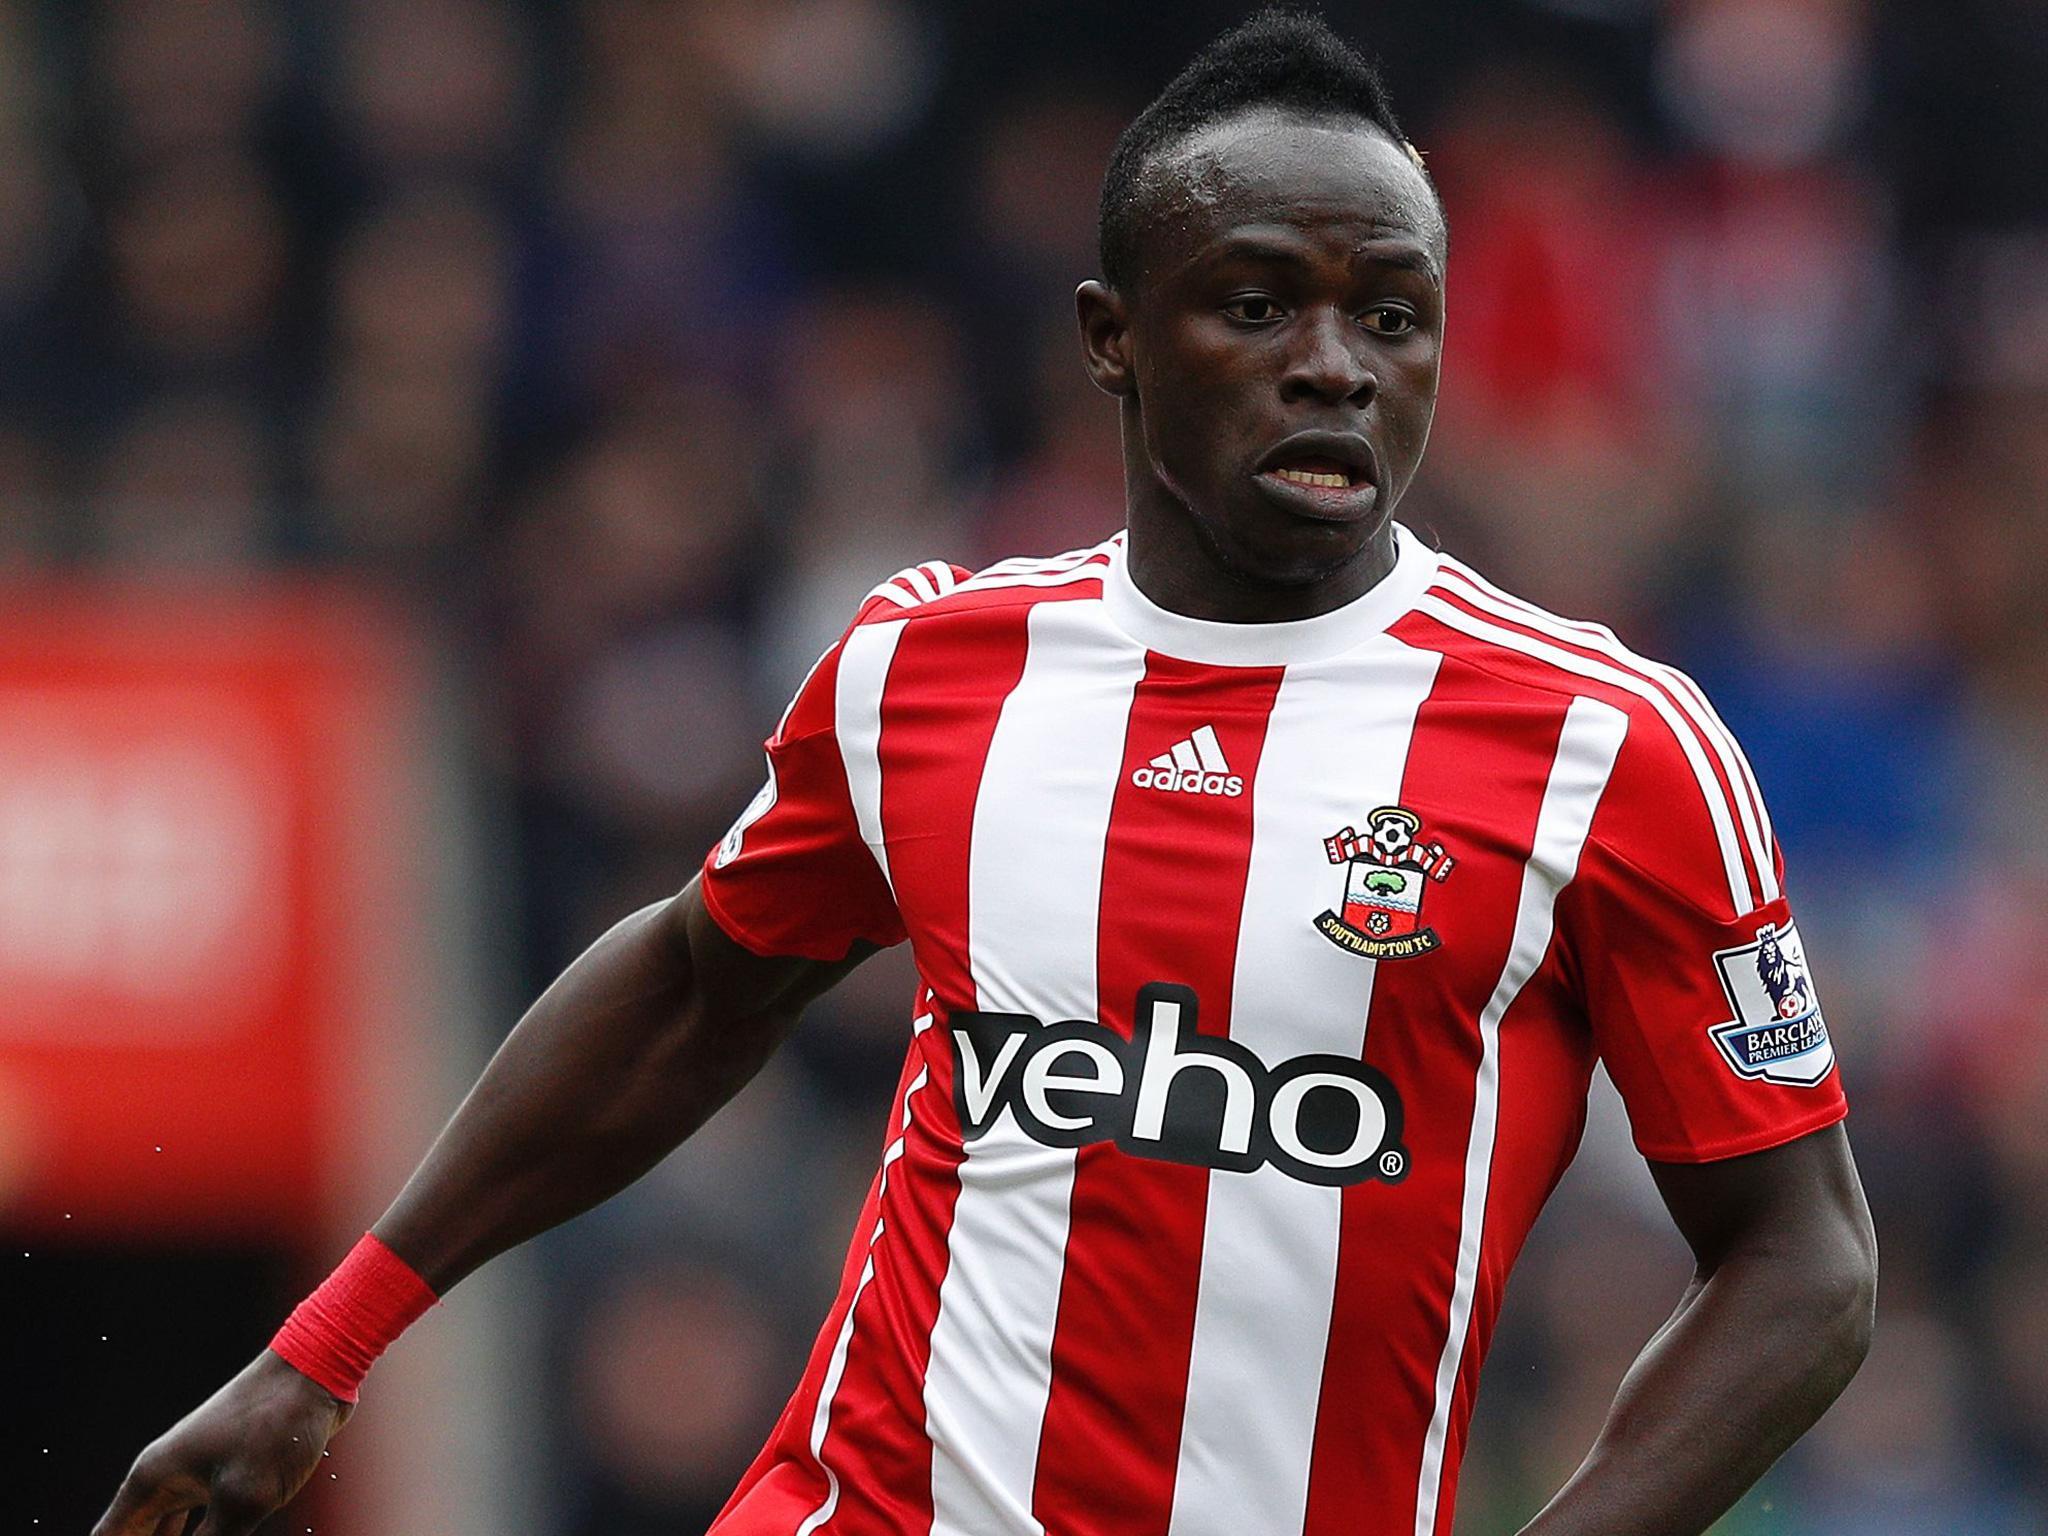 Sadio Mane: Liverpool Attacker to miss rest of season.